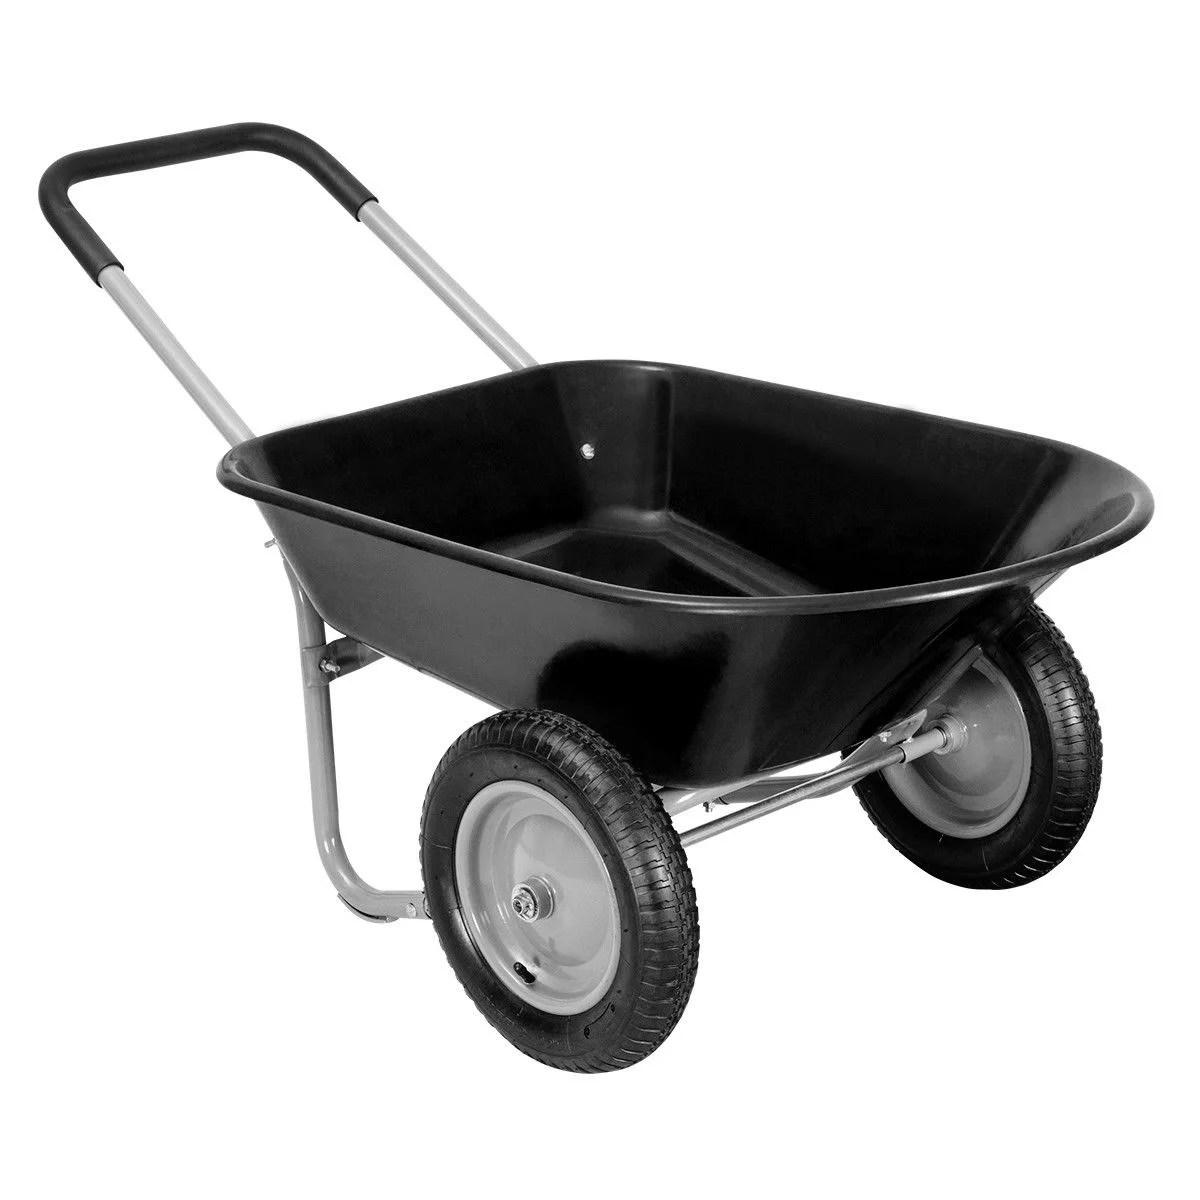 gymax heavy duty 2 tire wheelbarrow